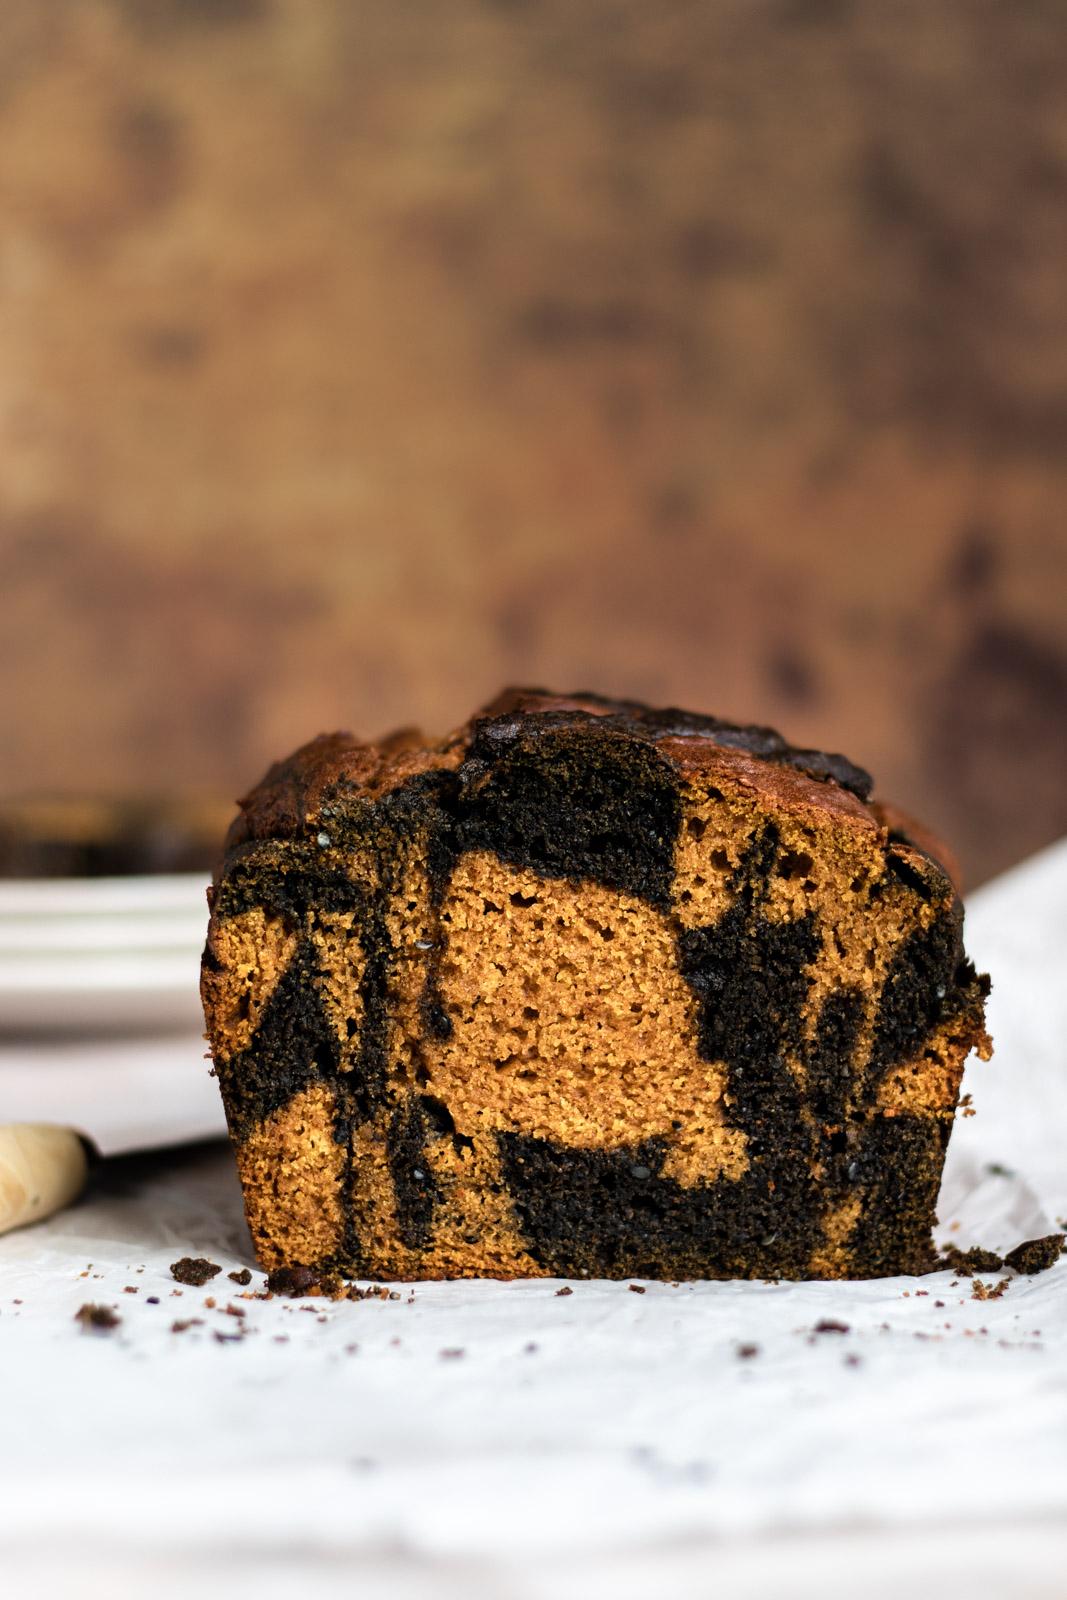 Crumb shot side-view of a loaf of black sesame swirl pumpkin bread